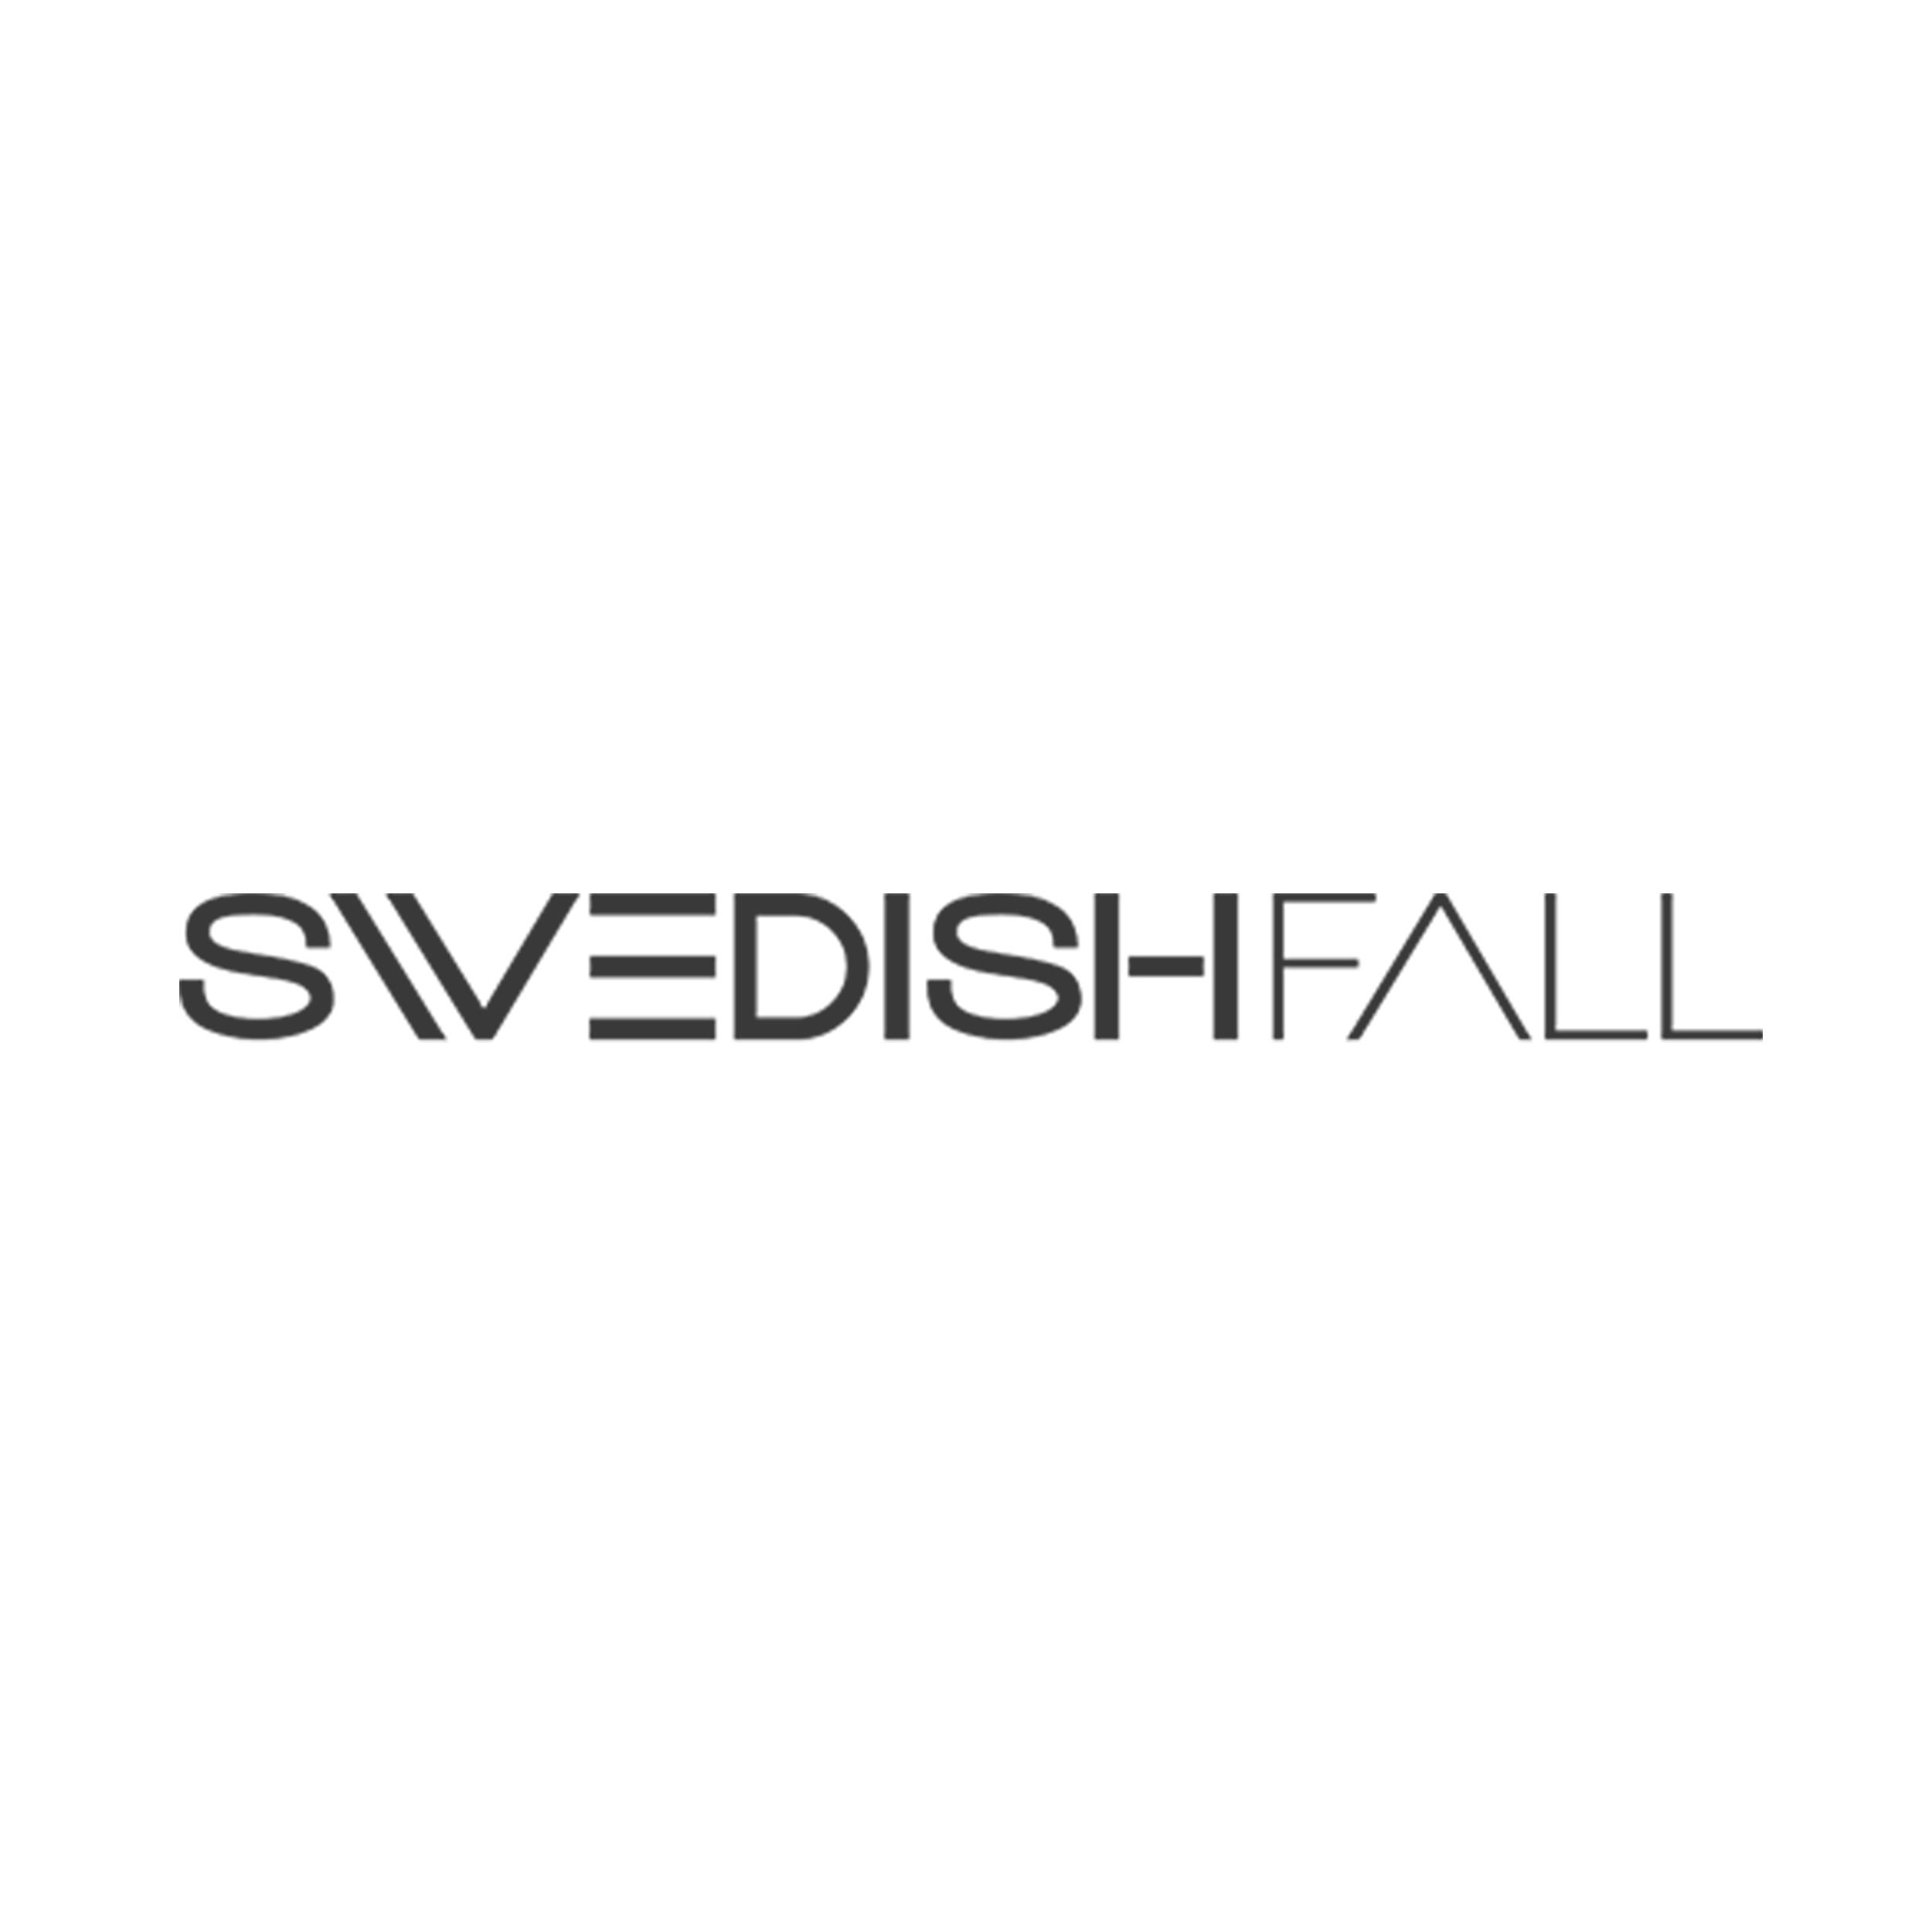 [ SWEDISH FALL ]